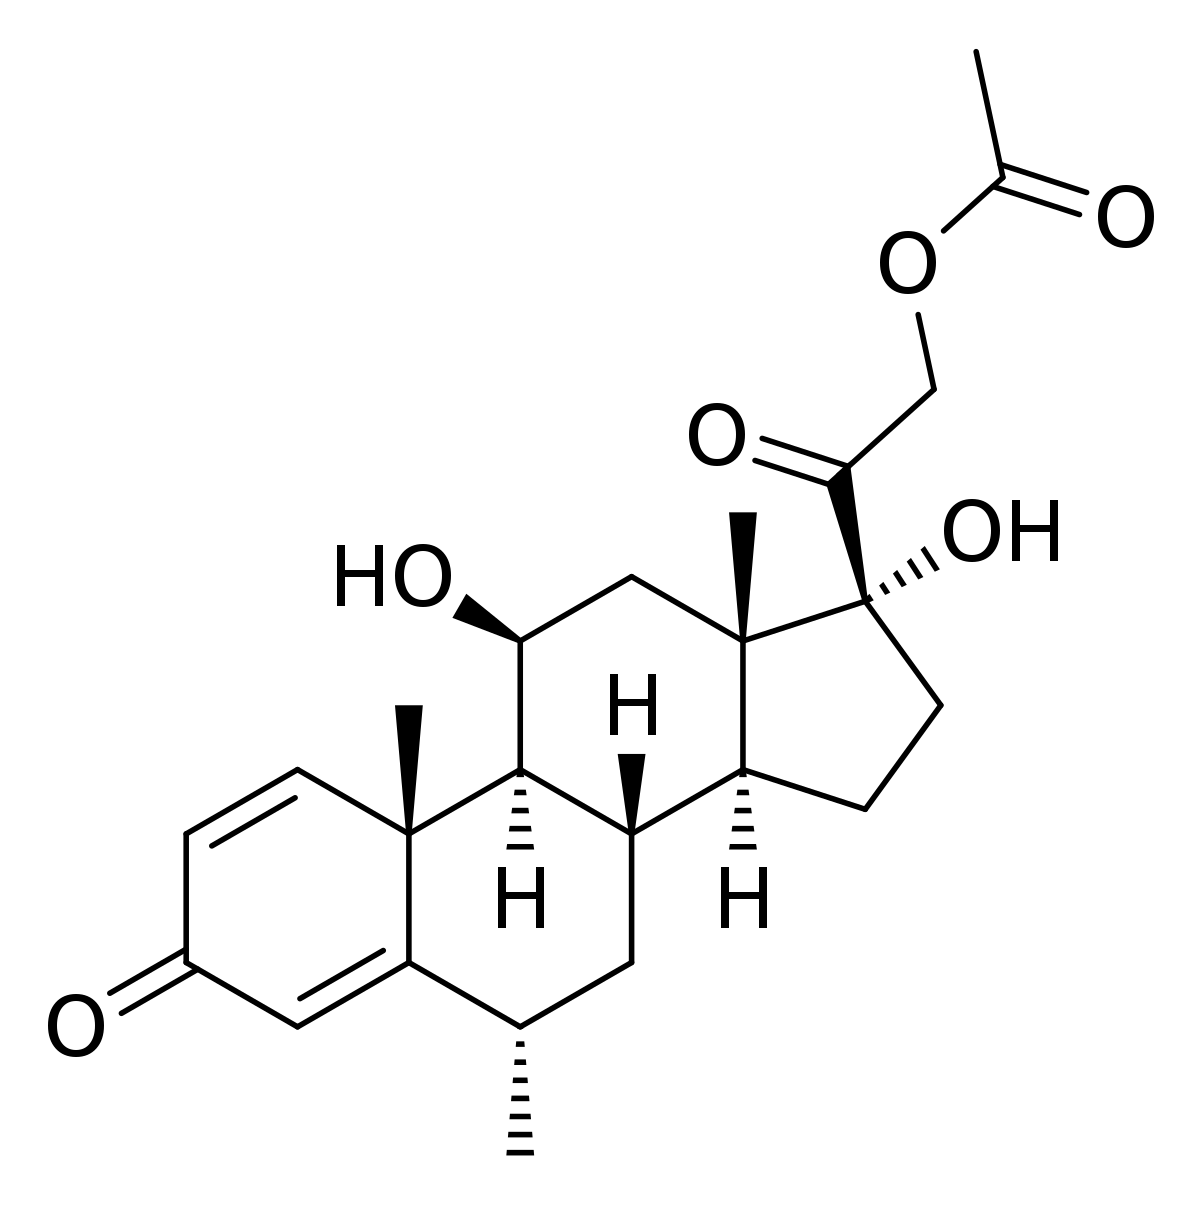 Methylprednisolone acetate (Medrol)